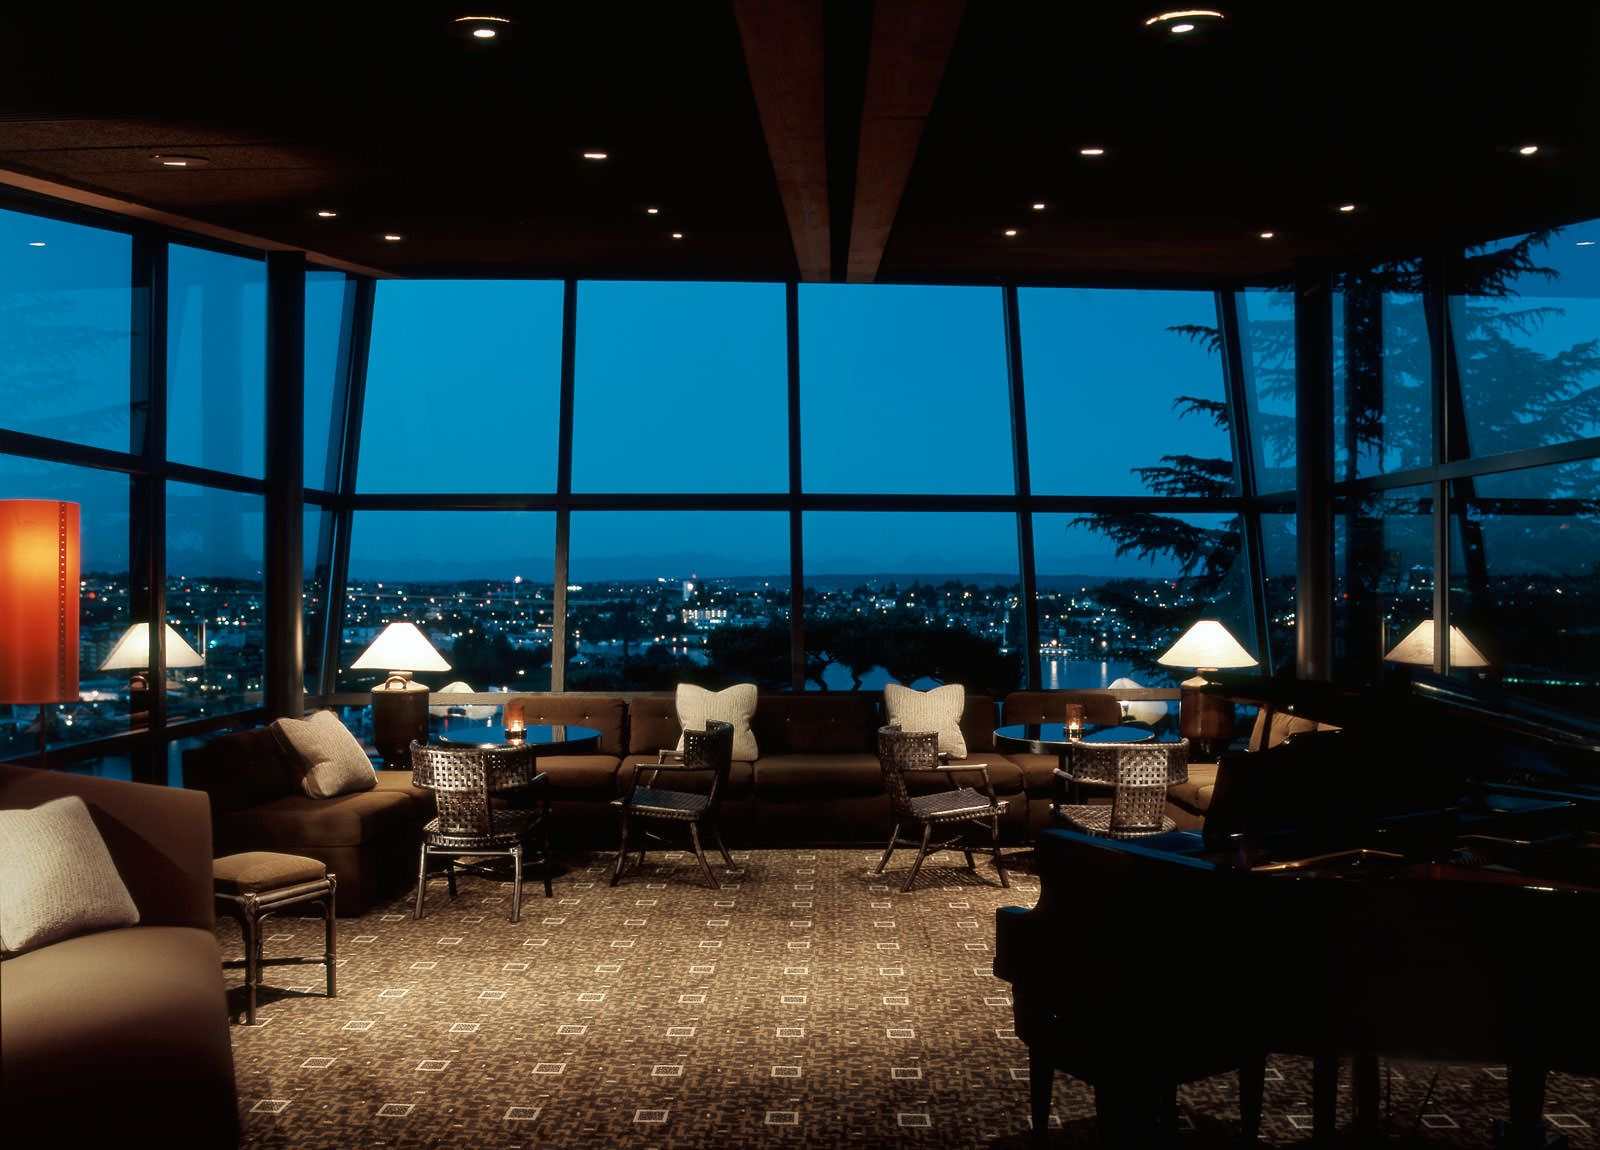 Doug rasar interior design llc canlis restaurant - Restaurant interior design seattle ...